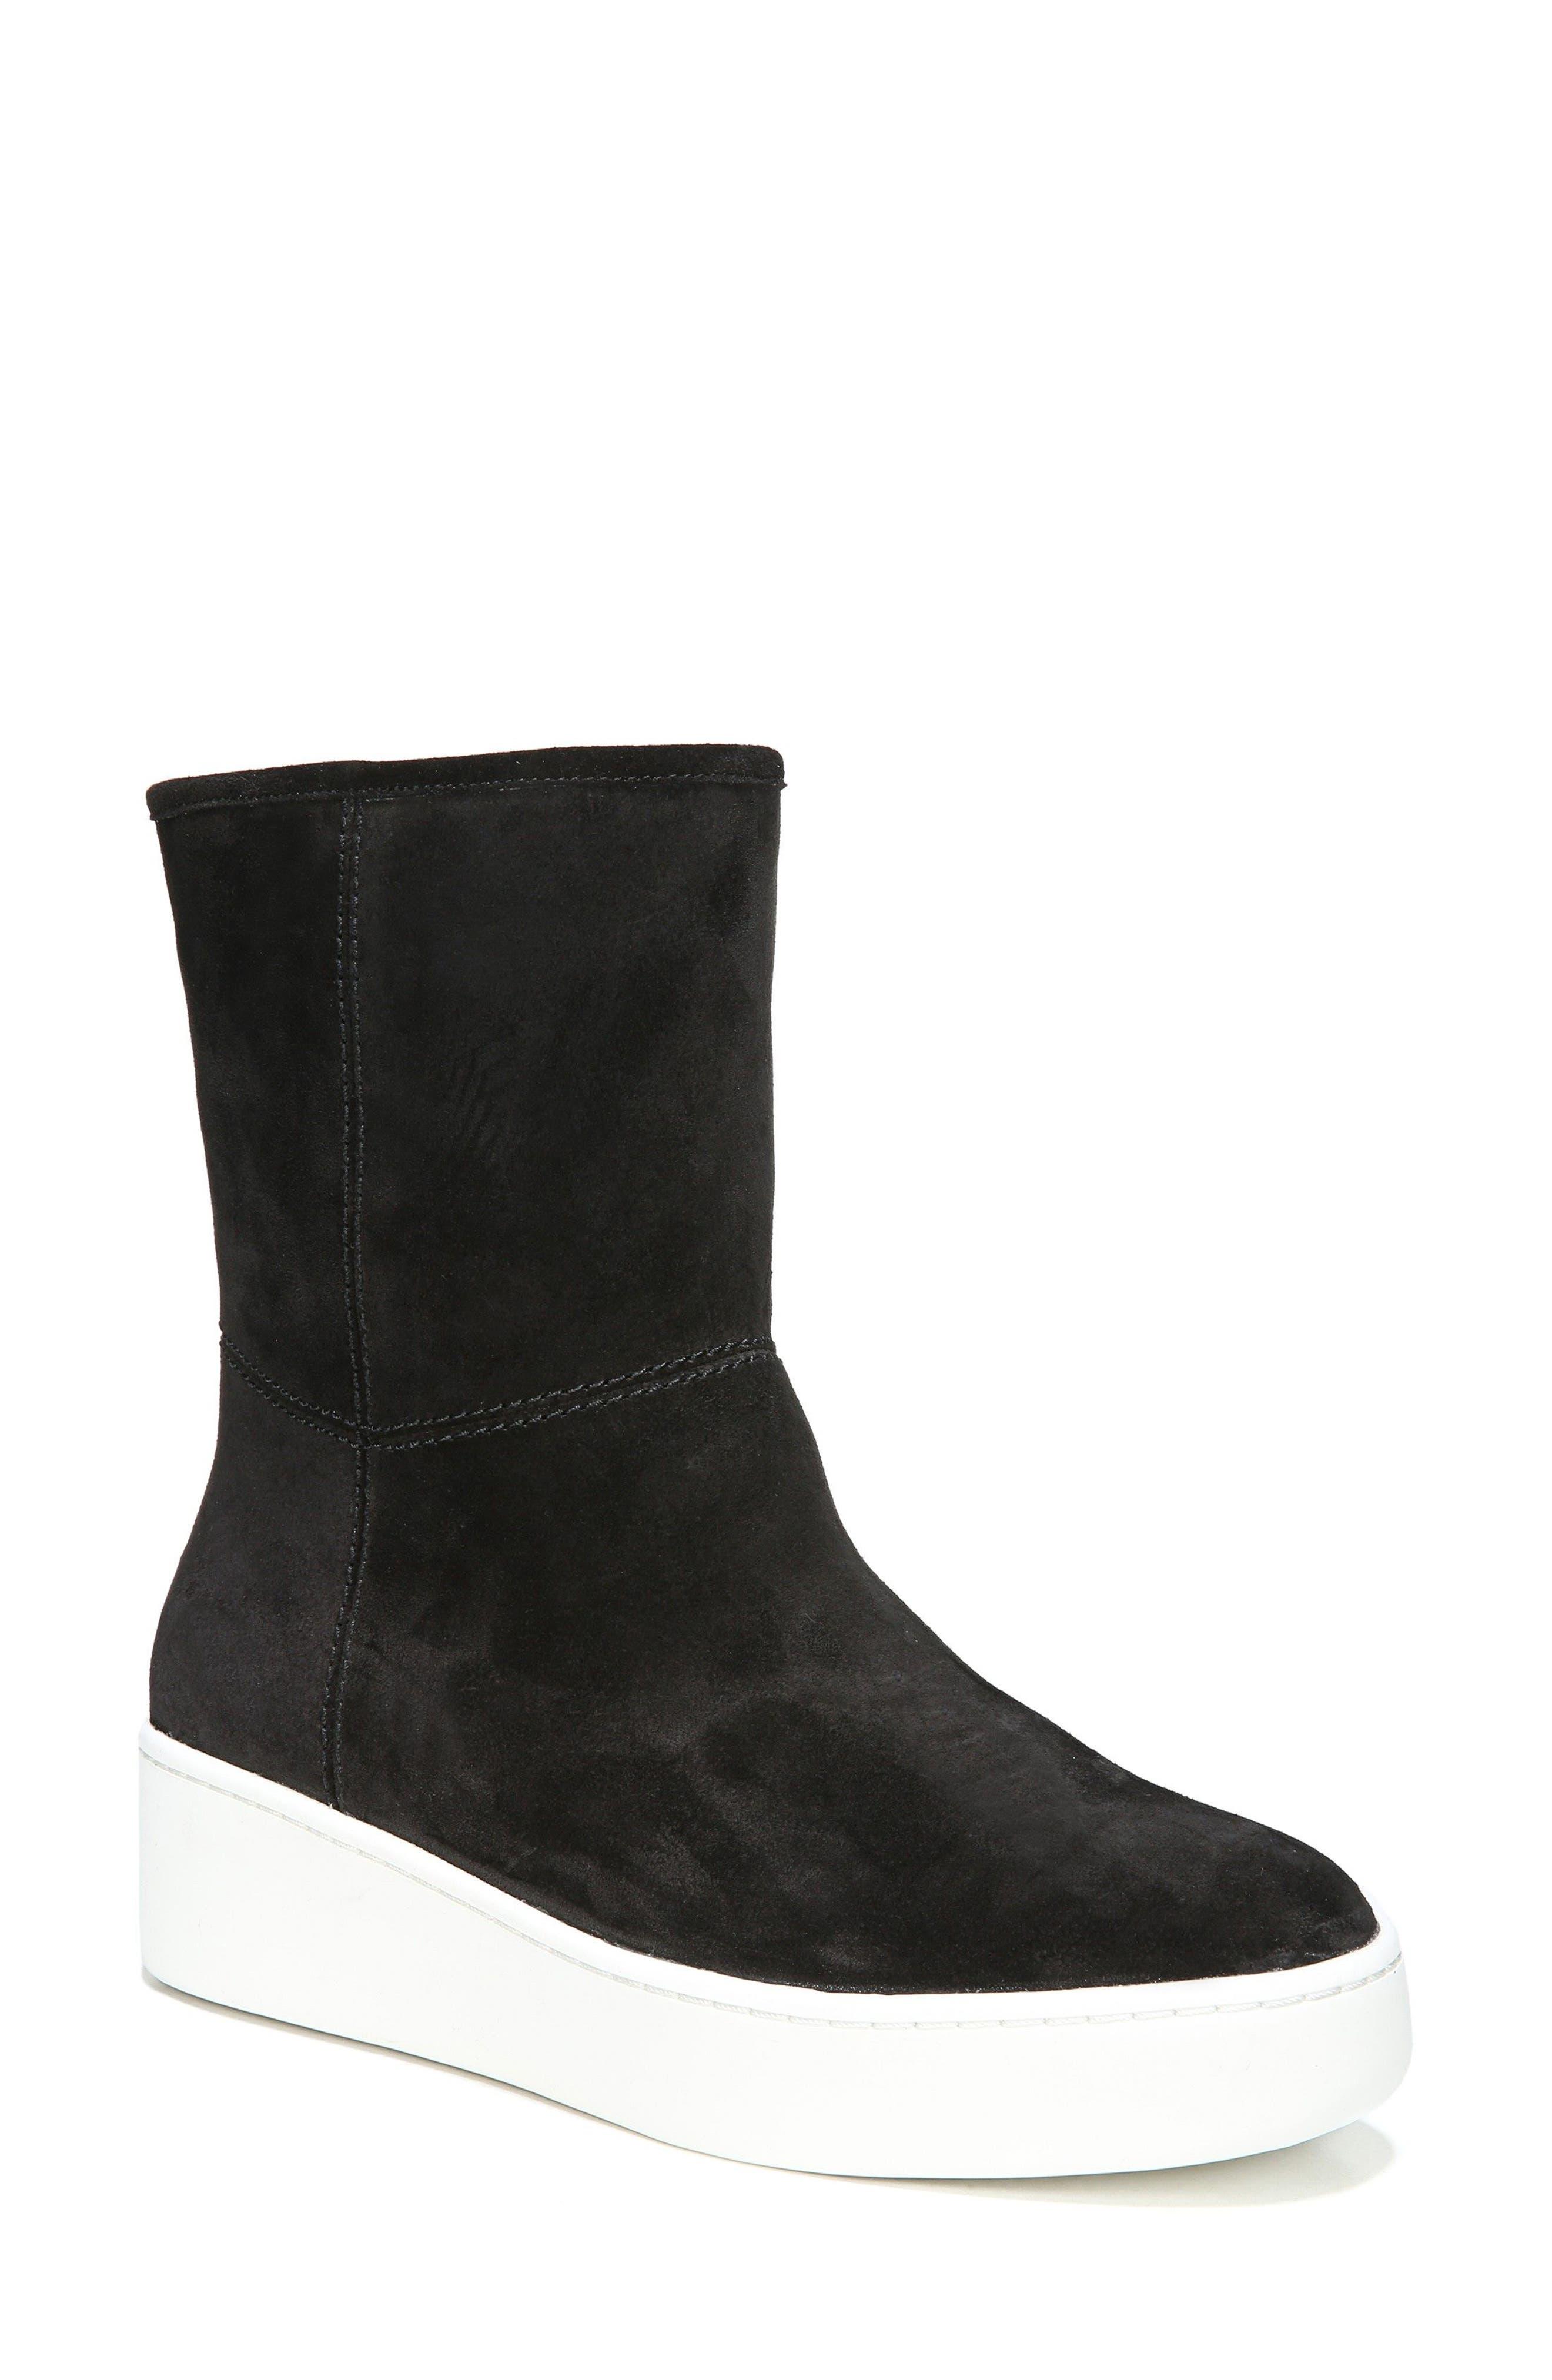 Elona Genuine Shearling Lined Sneaker Boot,                             Main thumbnail 1, color,                             001